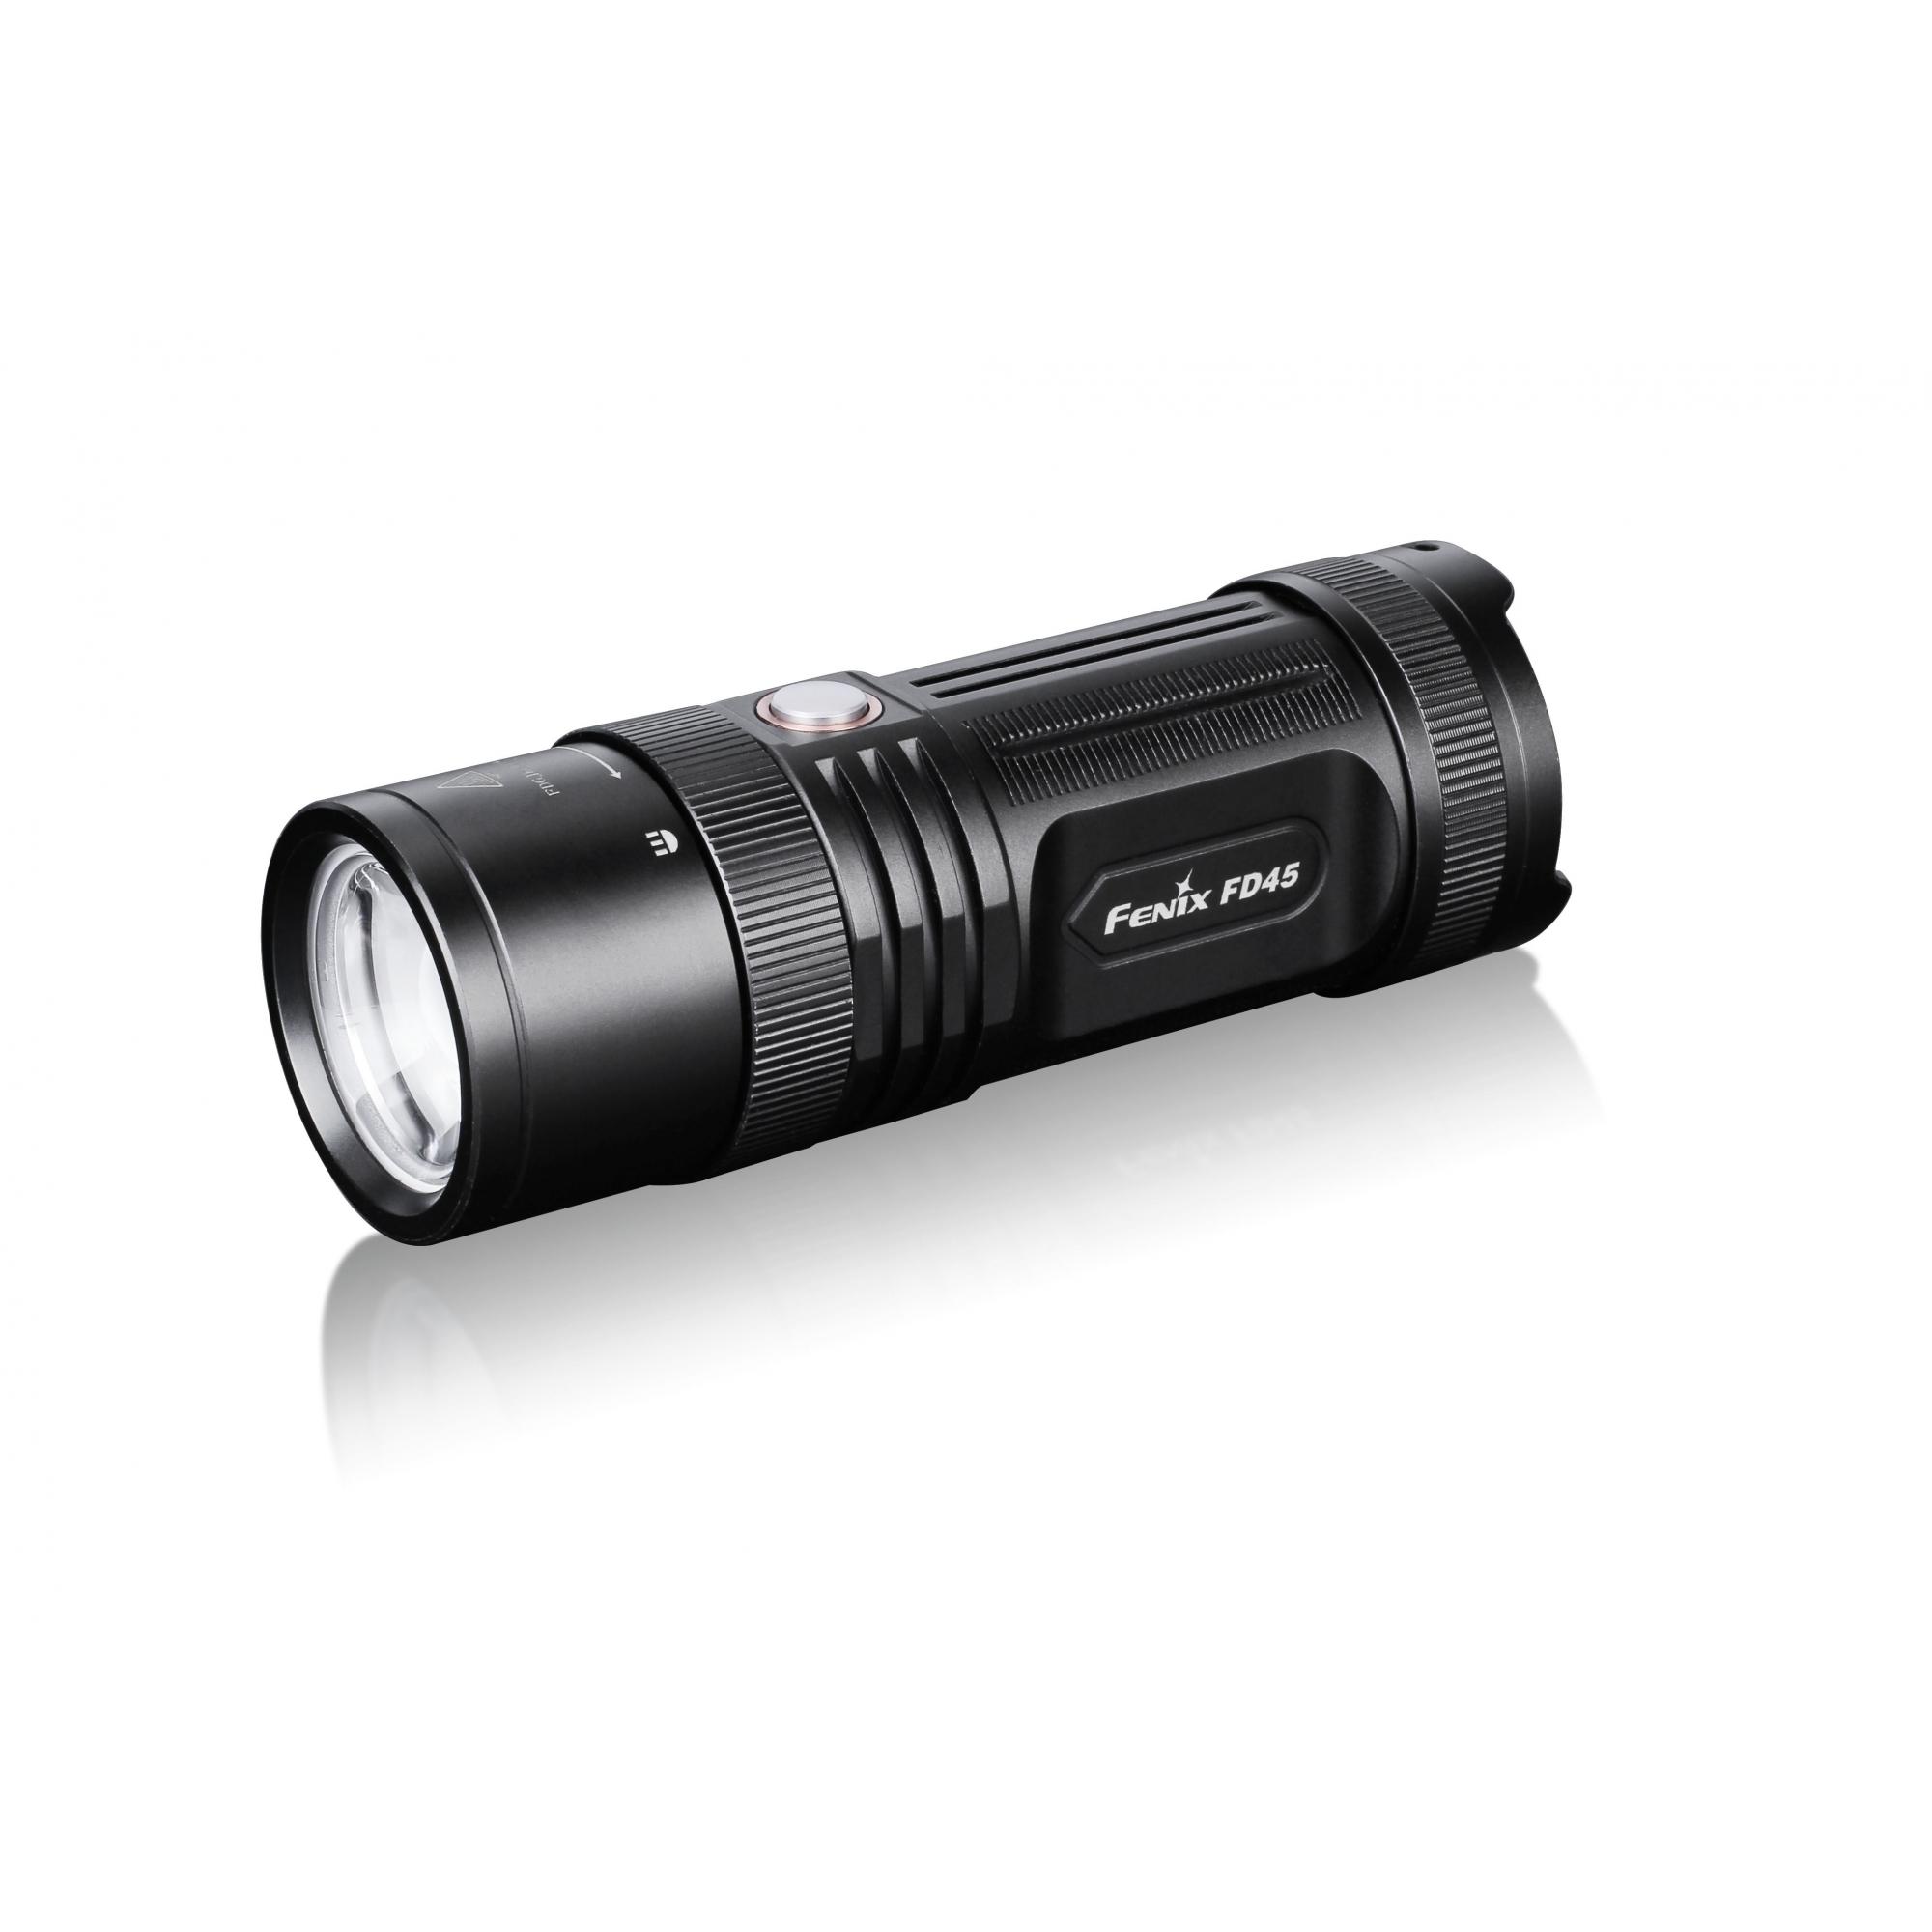 Lanterna Fenix FD45- Foco ajustável - 900 Lumens